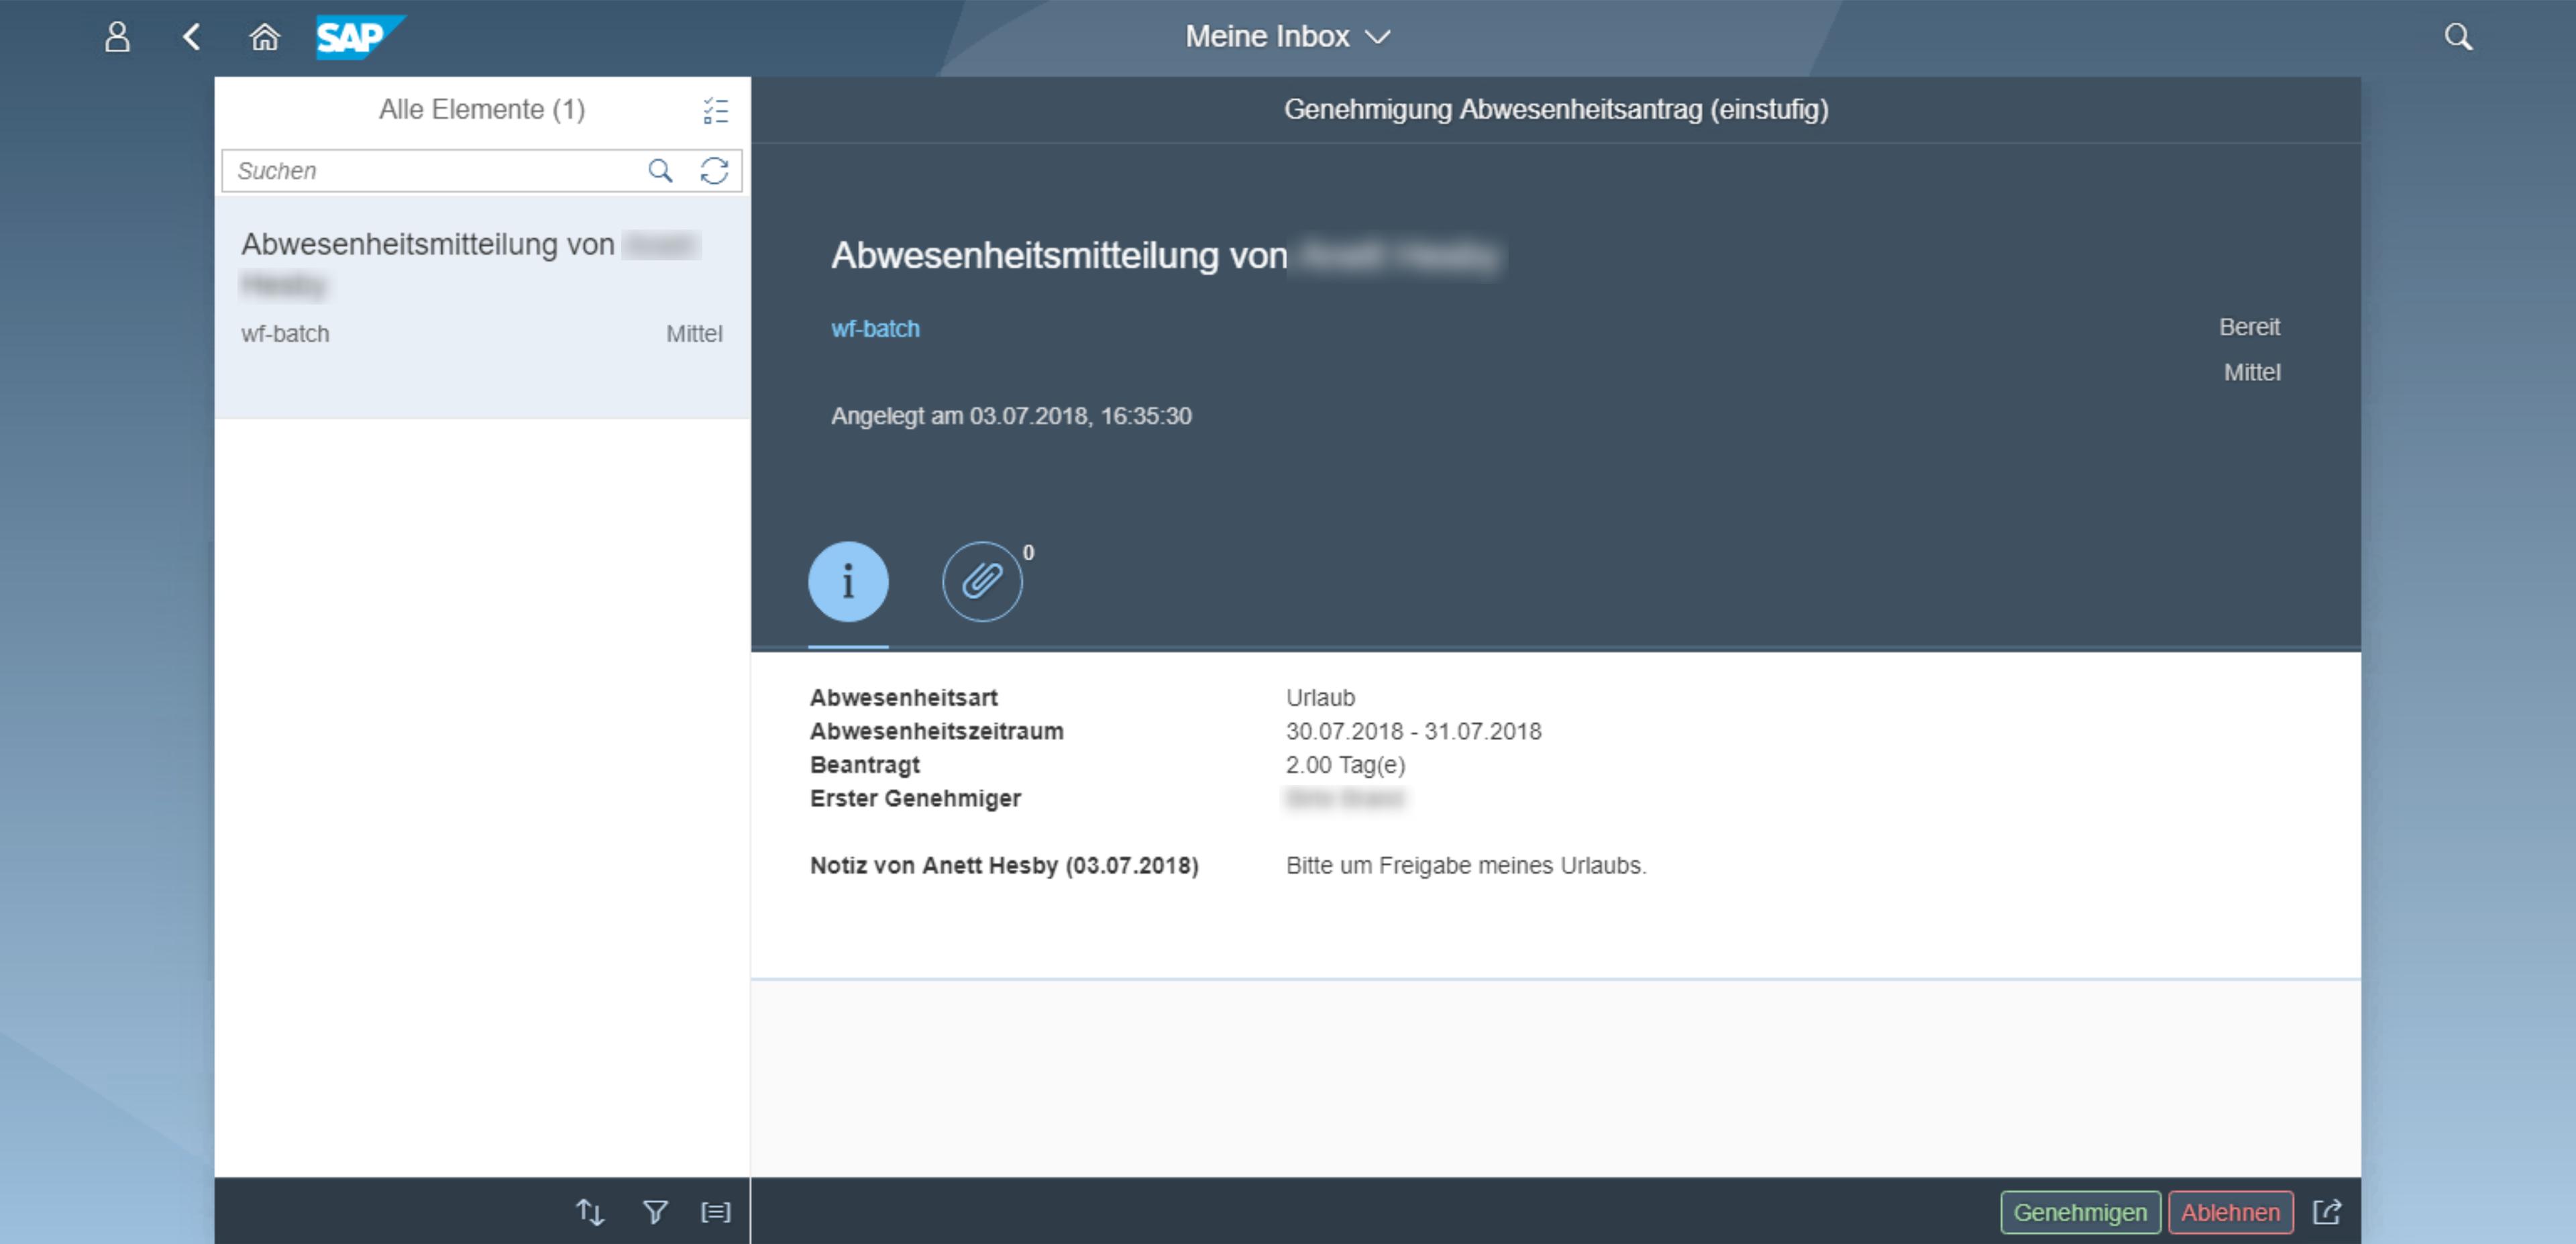 SAP Inbox mit Customizing-Elementen